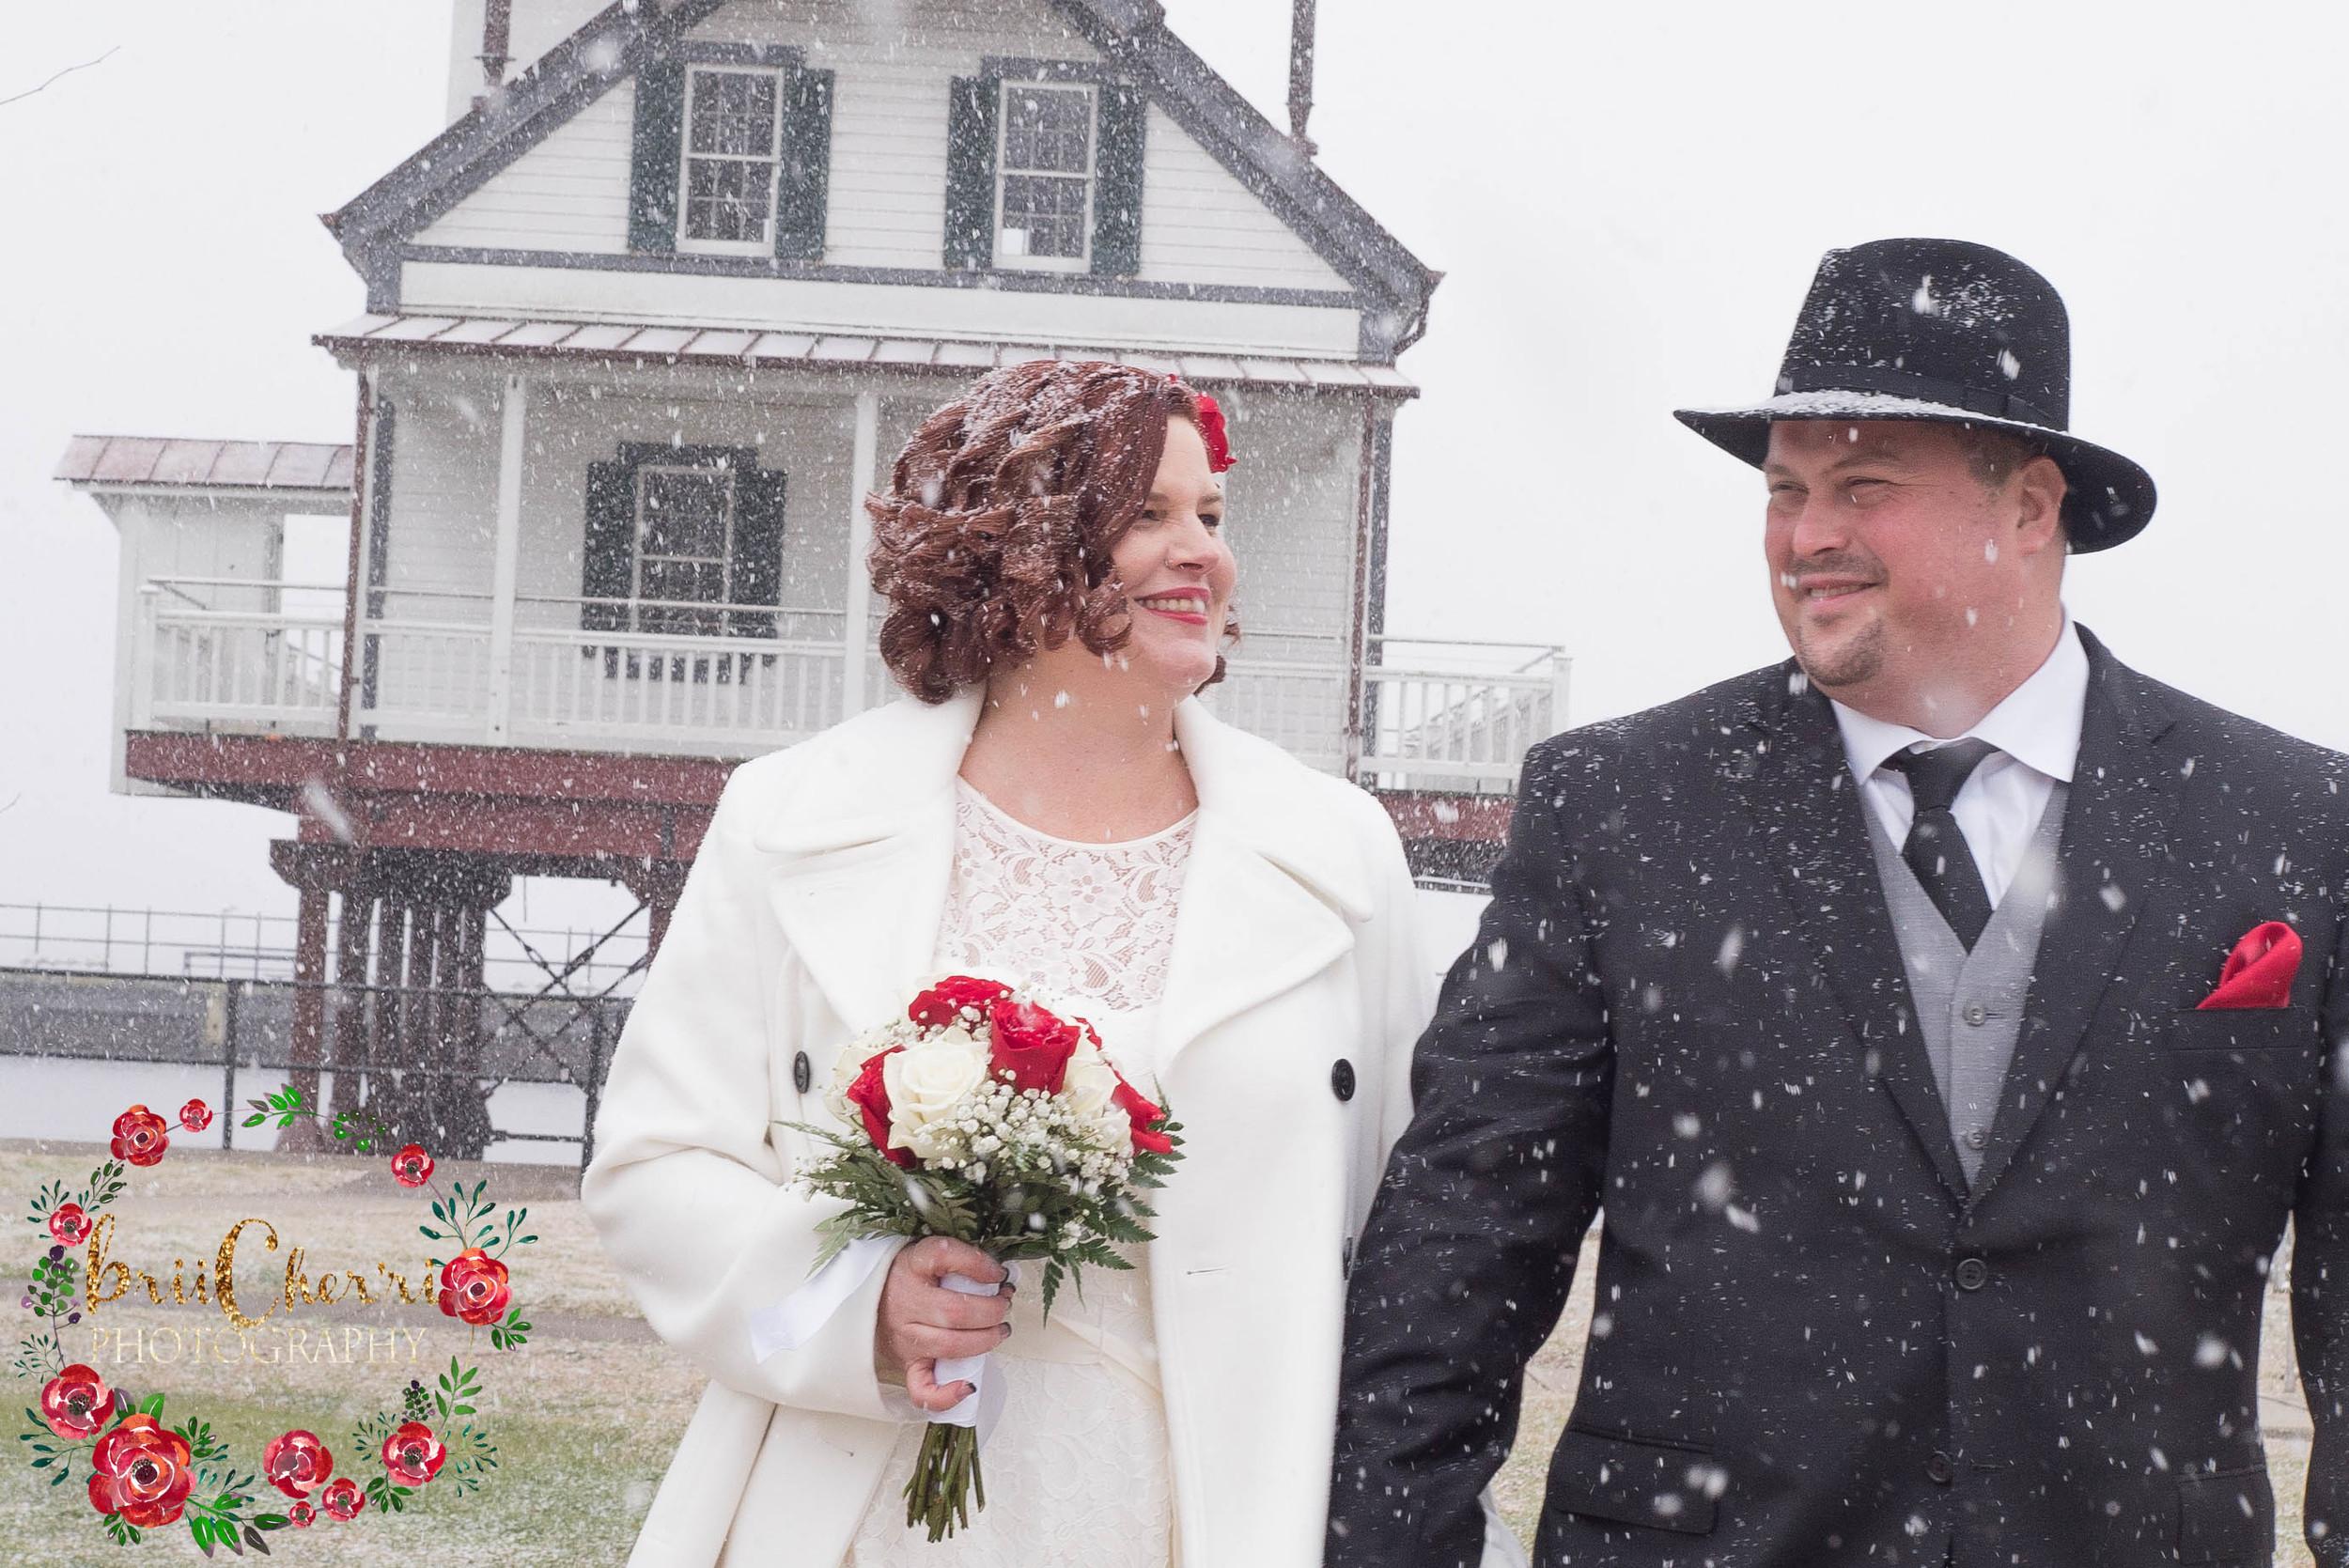 Winter Wedding with Brii Cher'ri Photography at Edenton Lighthouse & Waterfront in Edenton North Carolina.